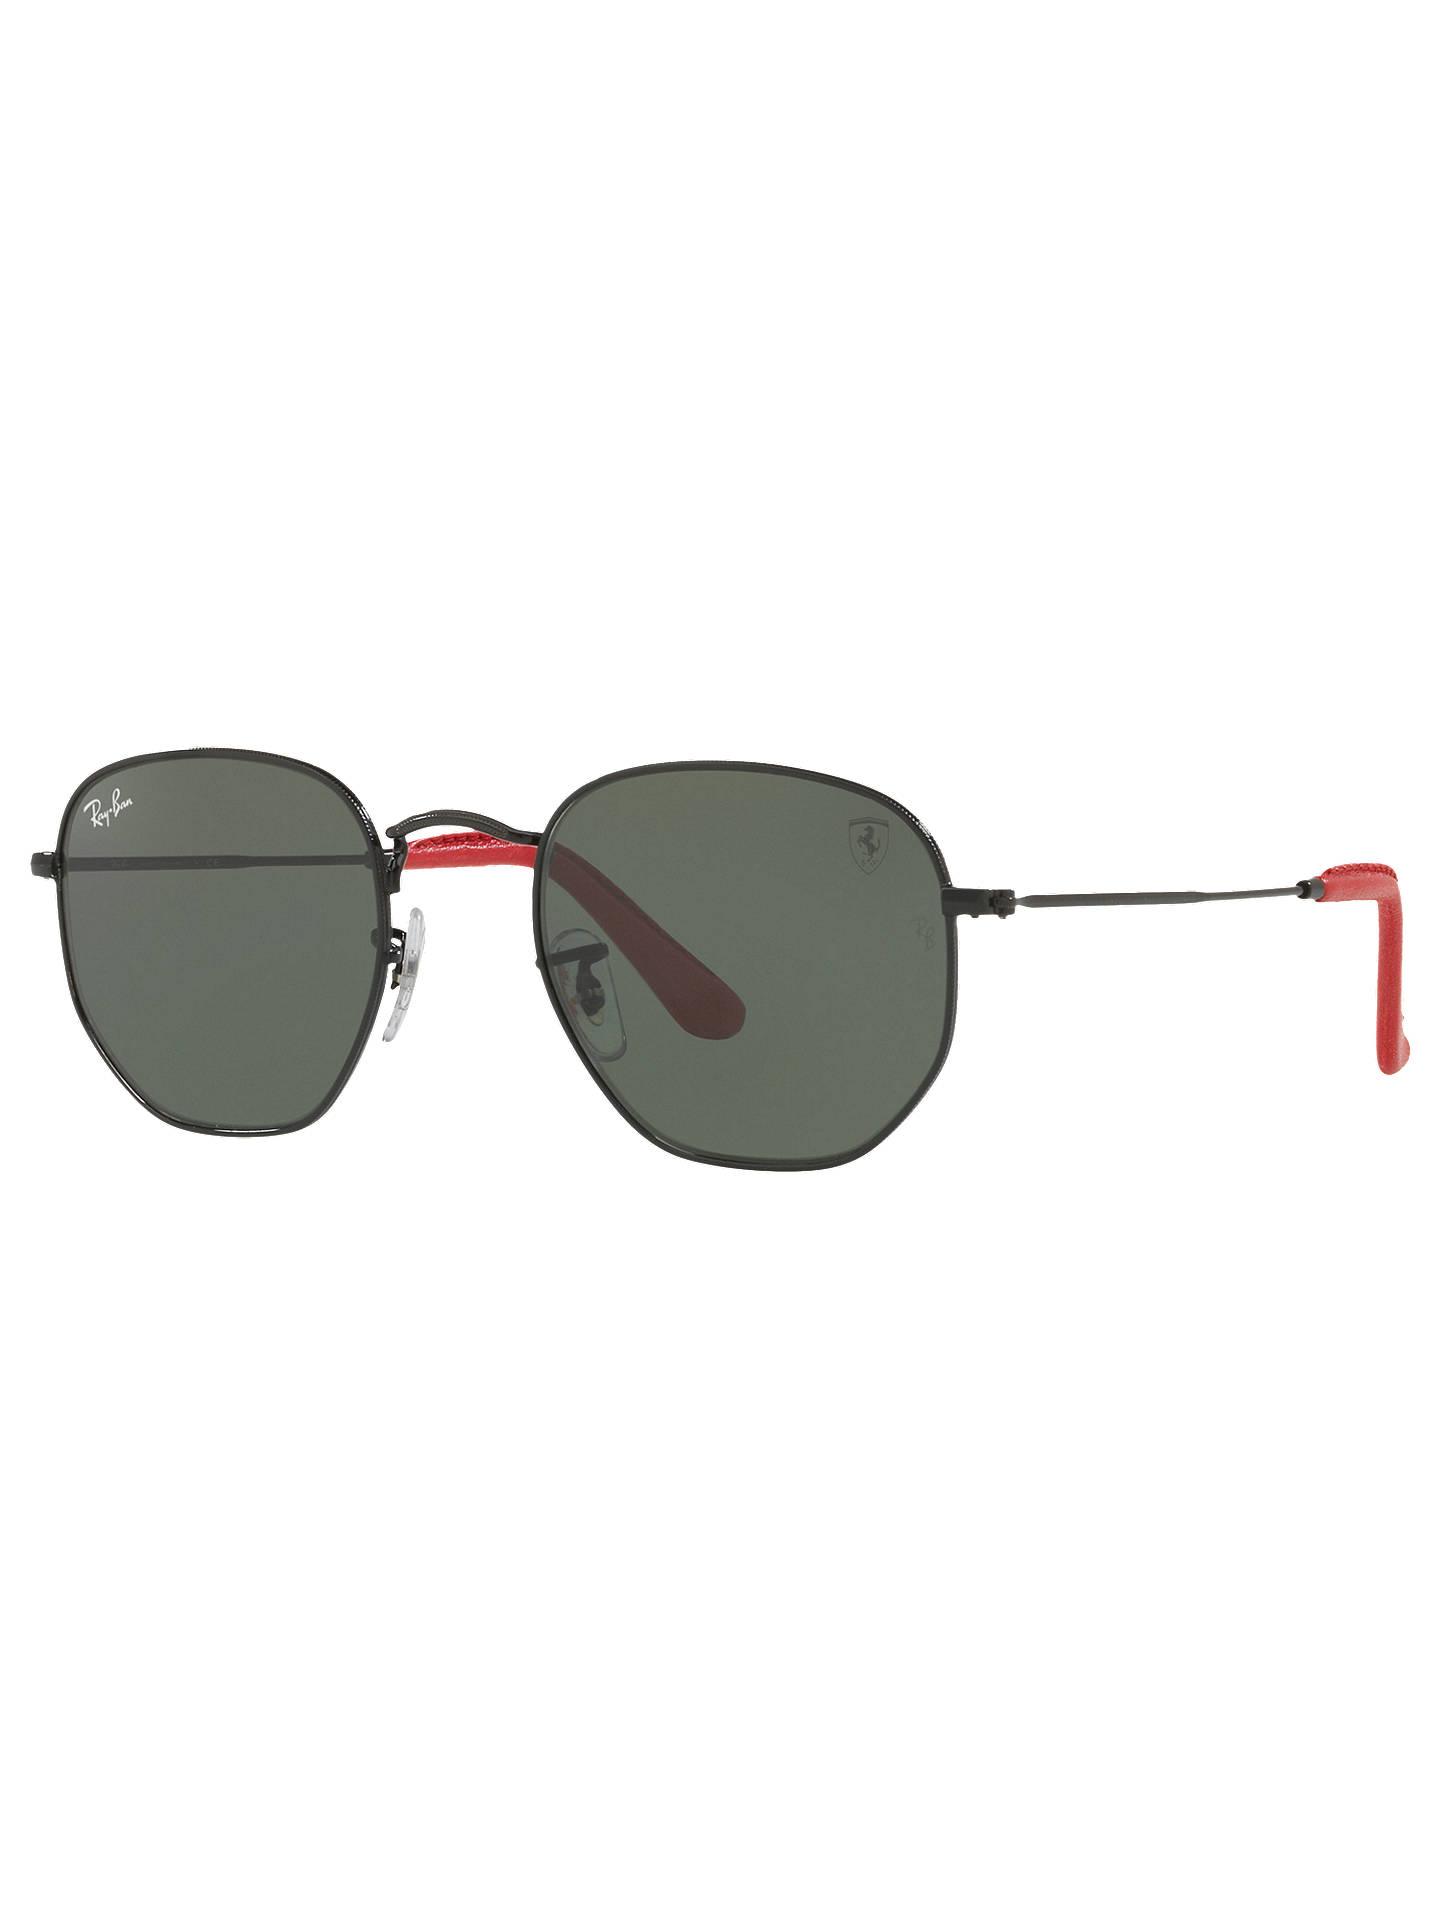 e83480f2ba Ray-Ban RB3548 Scuderia Ferrari Hexagonal Flat Lens Sunglasses ...